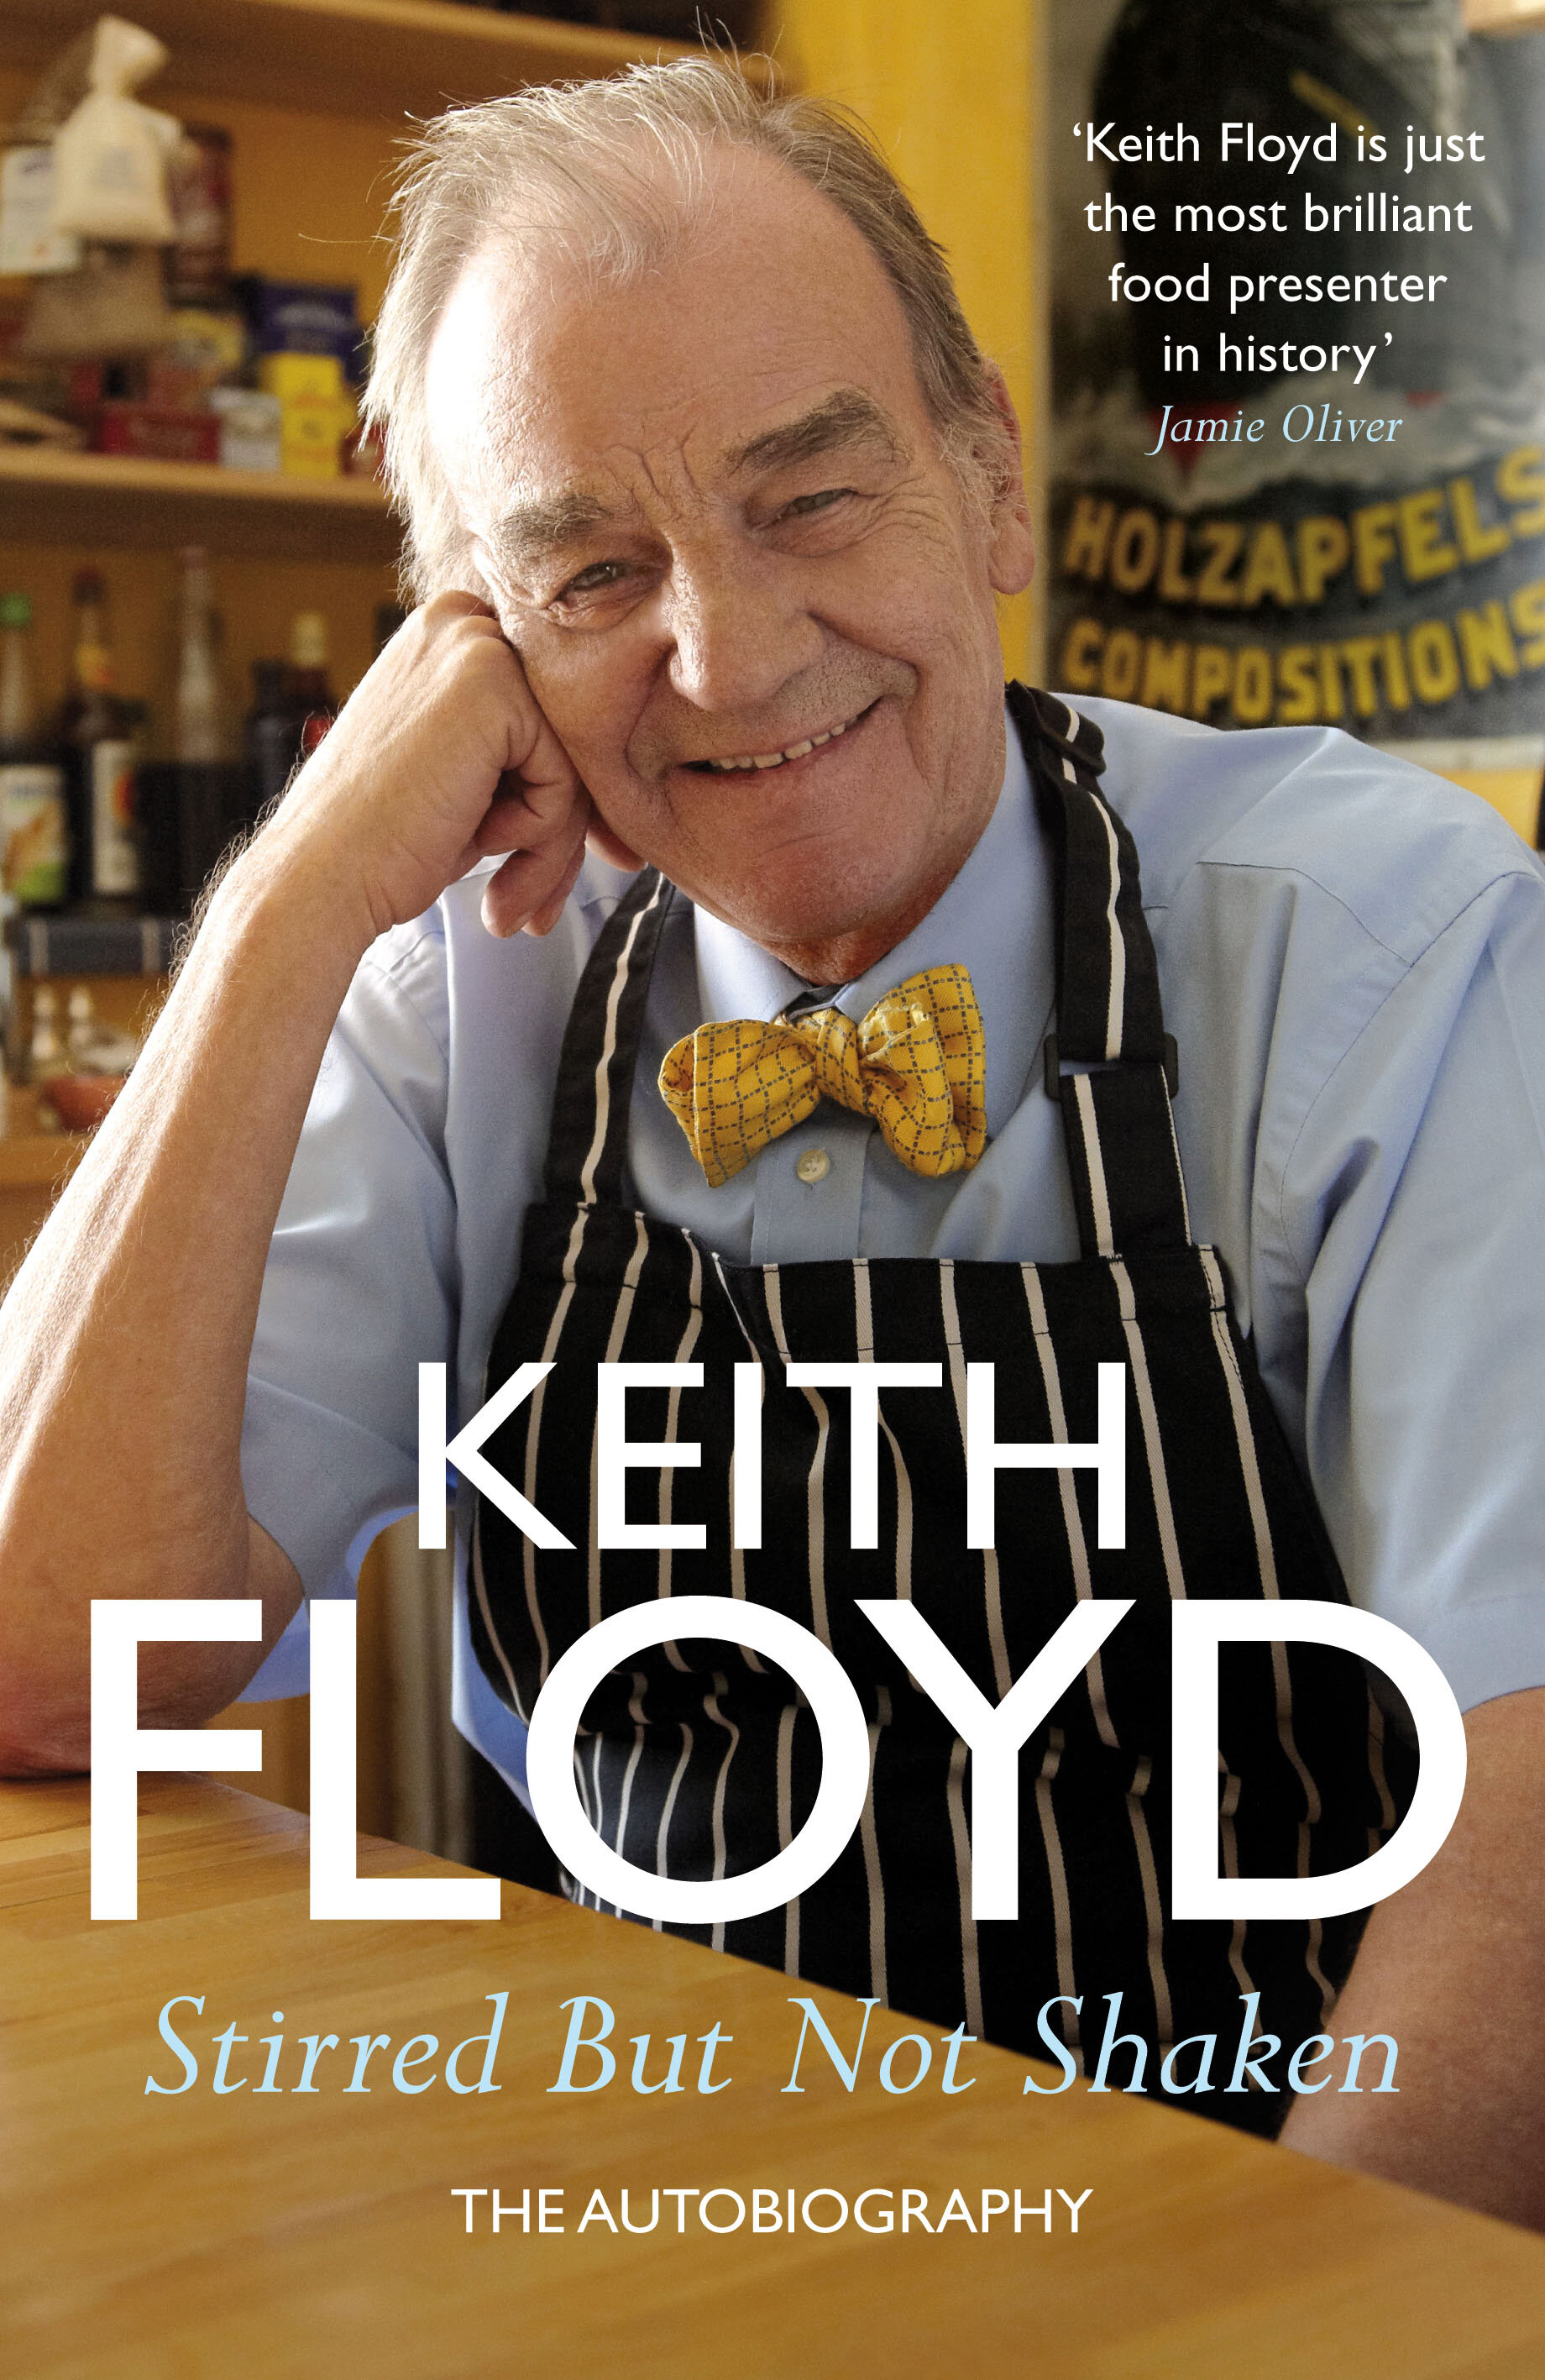 23  KEITH FLOYD  Chef  (The Autobiography Hardback)  .jpg